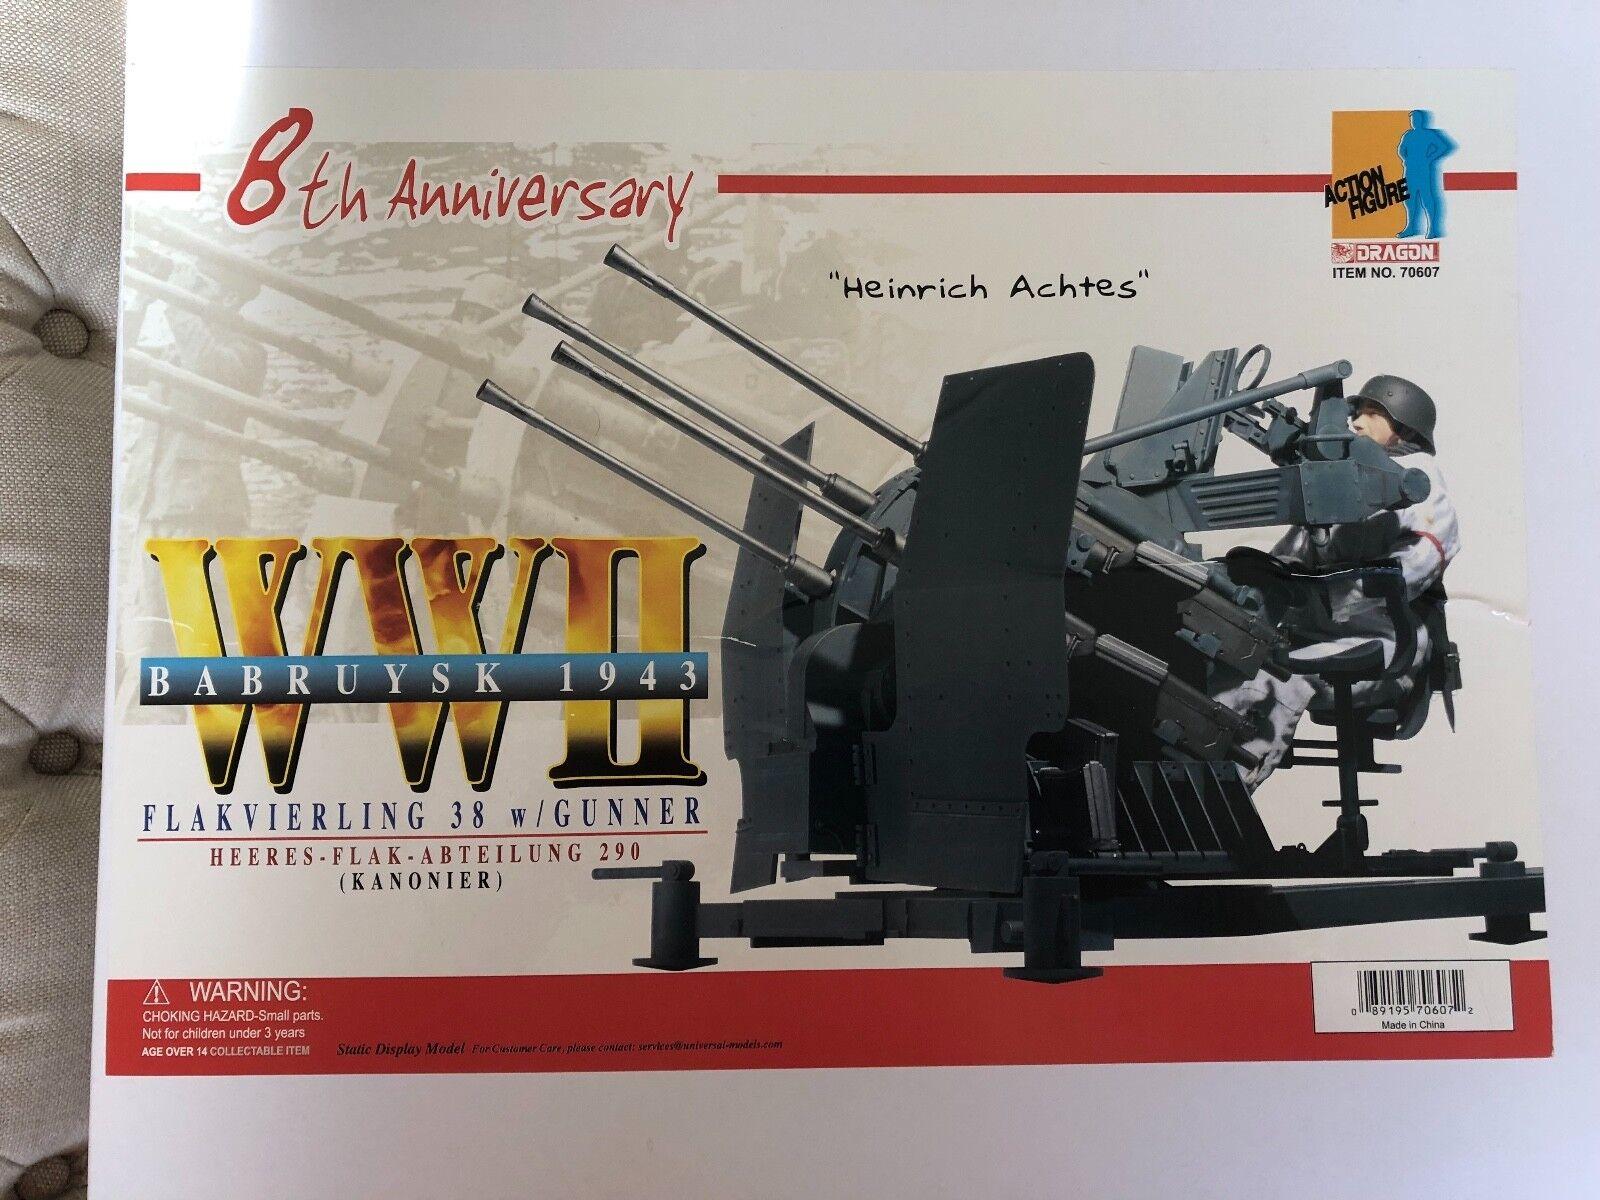 Dragon 8th aniversario Flakvierling 38 con artillero  Heinrich achtes  Babruysk 1943